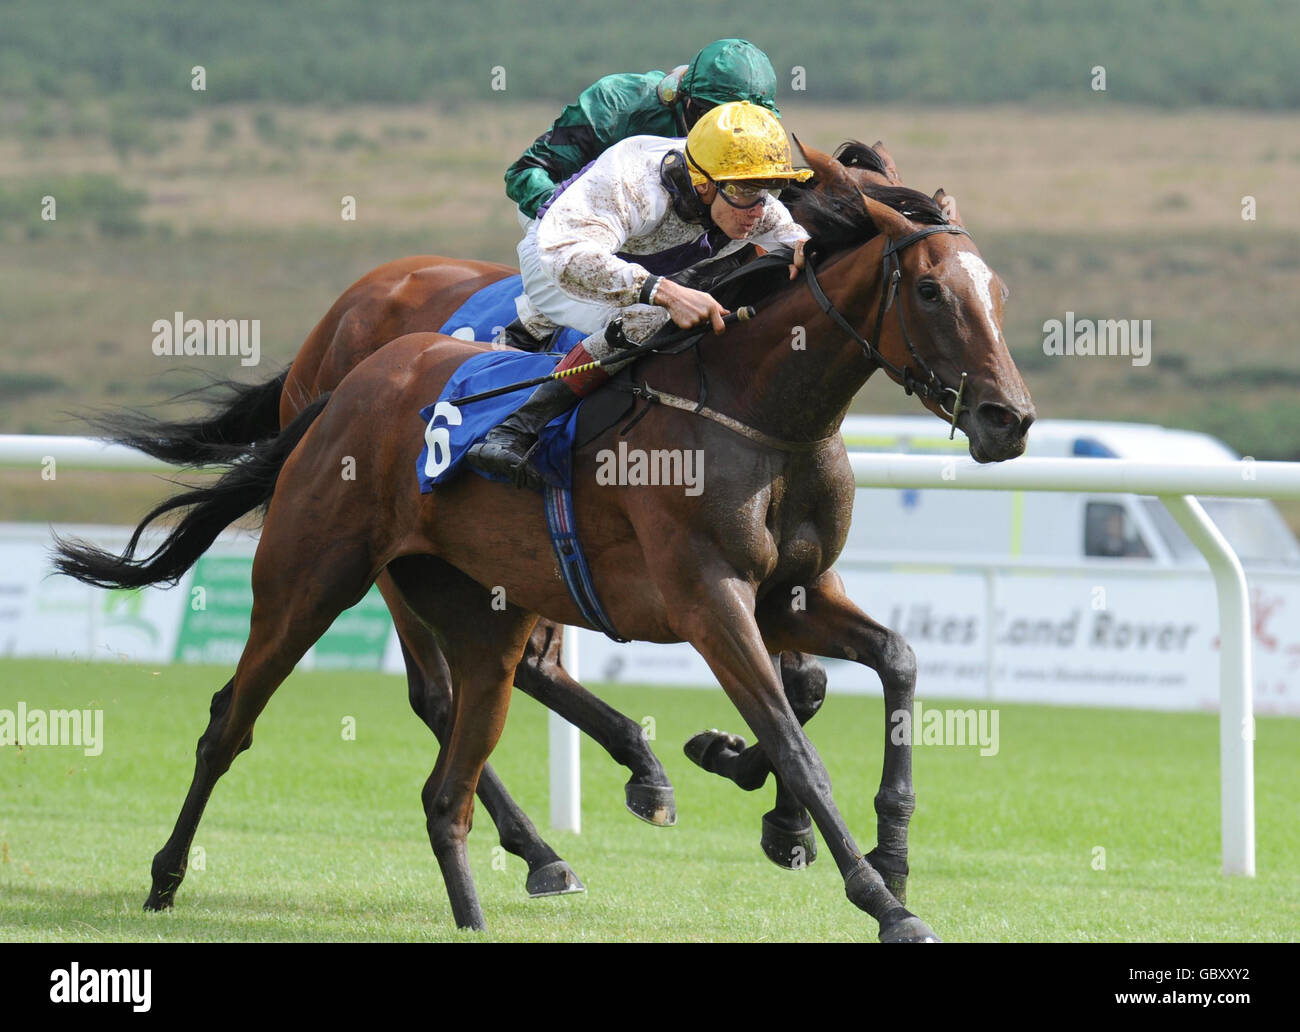 Horse Racing - Ffos Las Racecourse - Stock Image